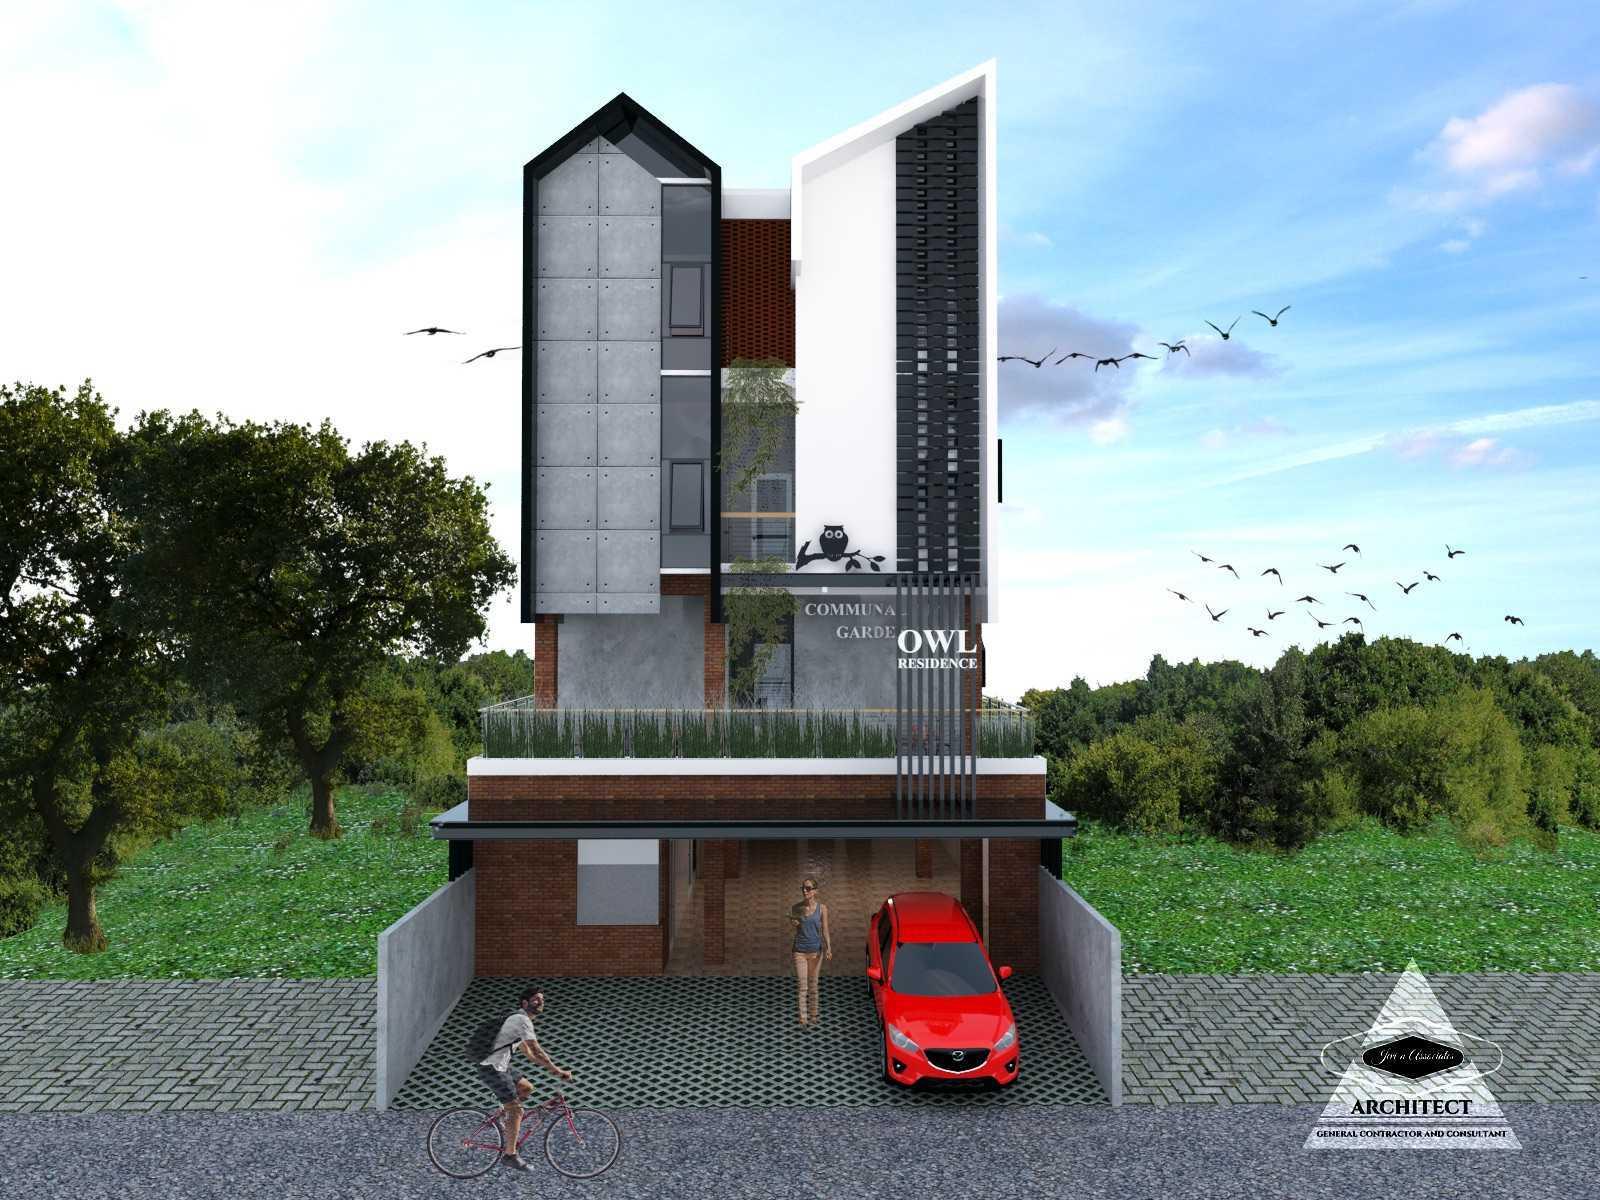 Jevi N Associates Owl Residence Lippo Karawaci Lippo Karawaci Facade Industrial,kontemporer  24207